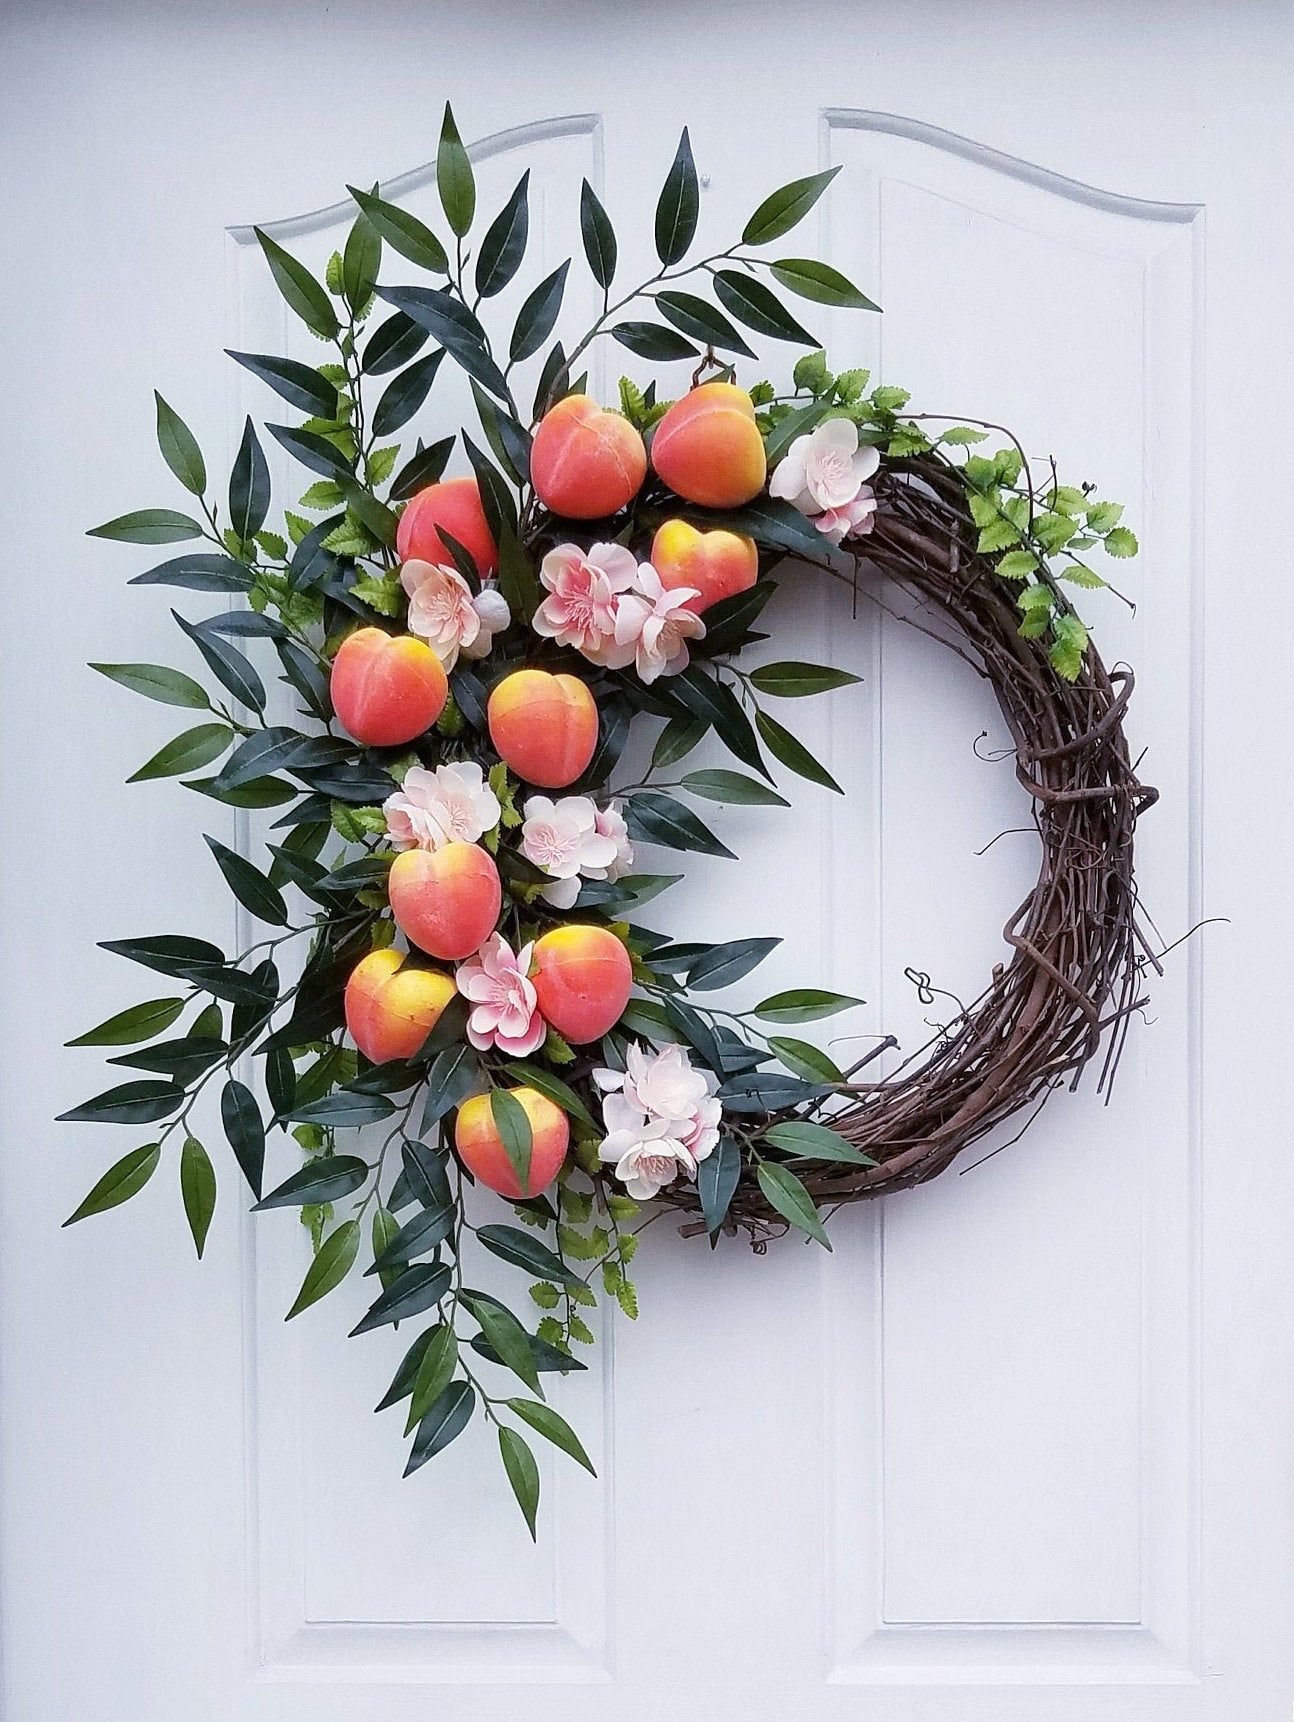 house warming farmhouse decor spring wreath Apple wreath grapevine wreath summer wreath farmhouse wreath fruit wreath apple decor